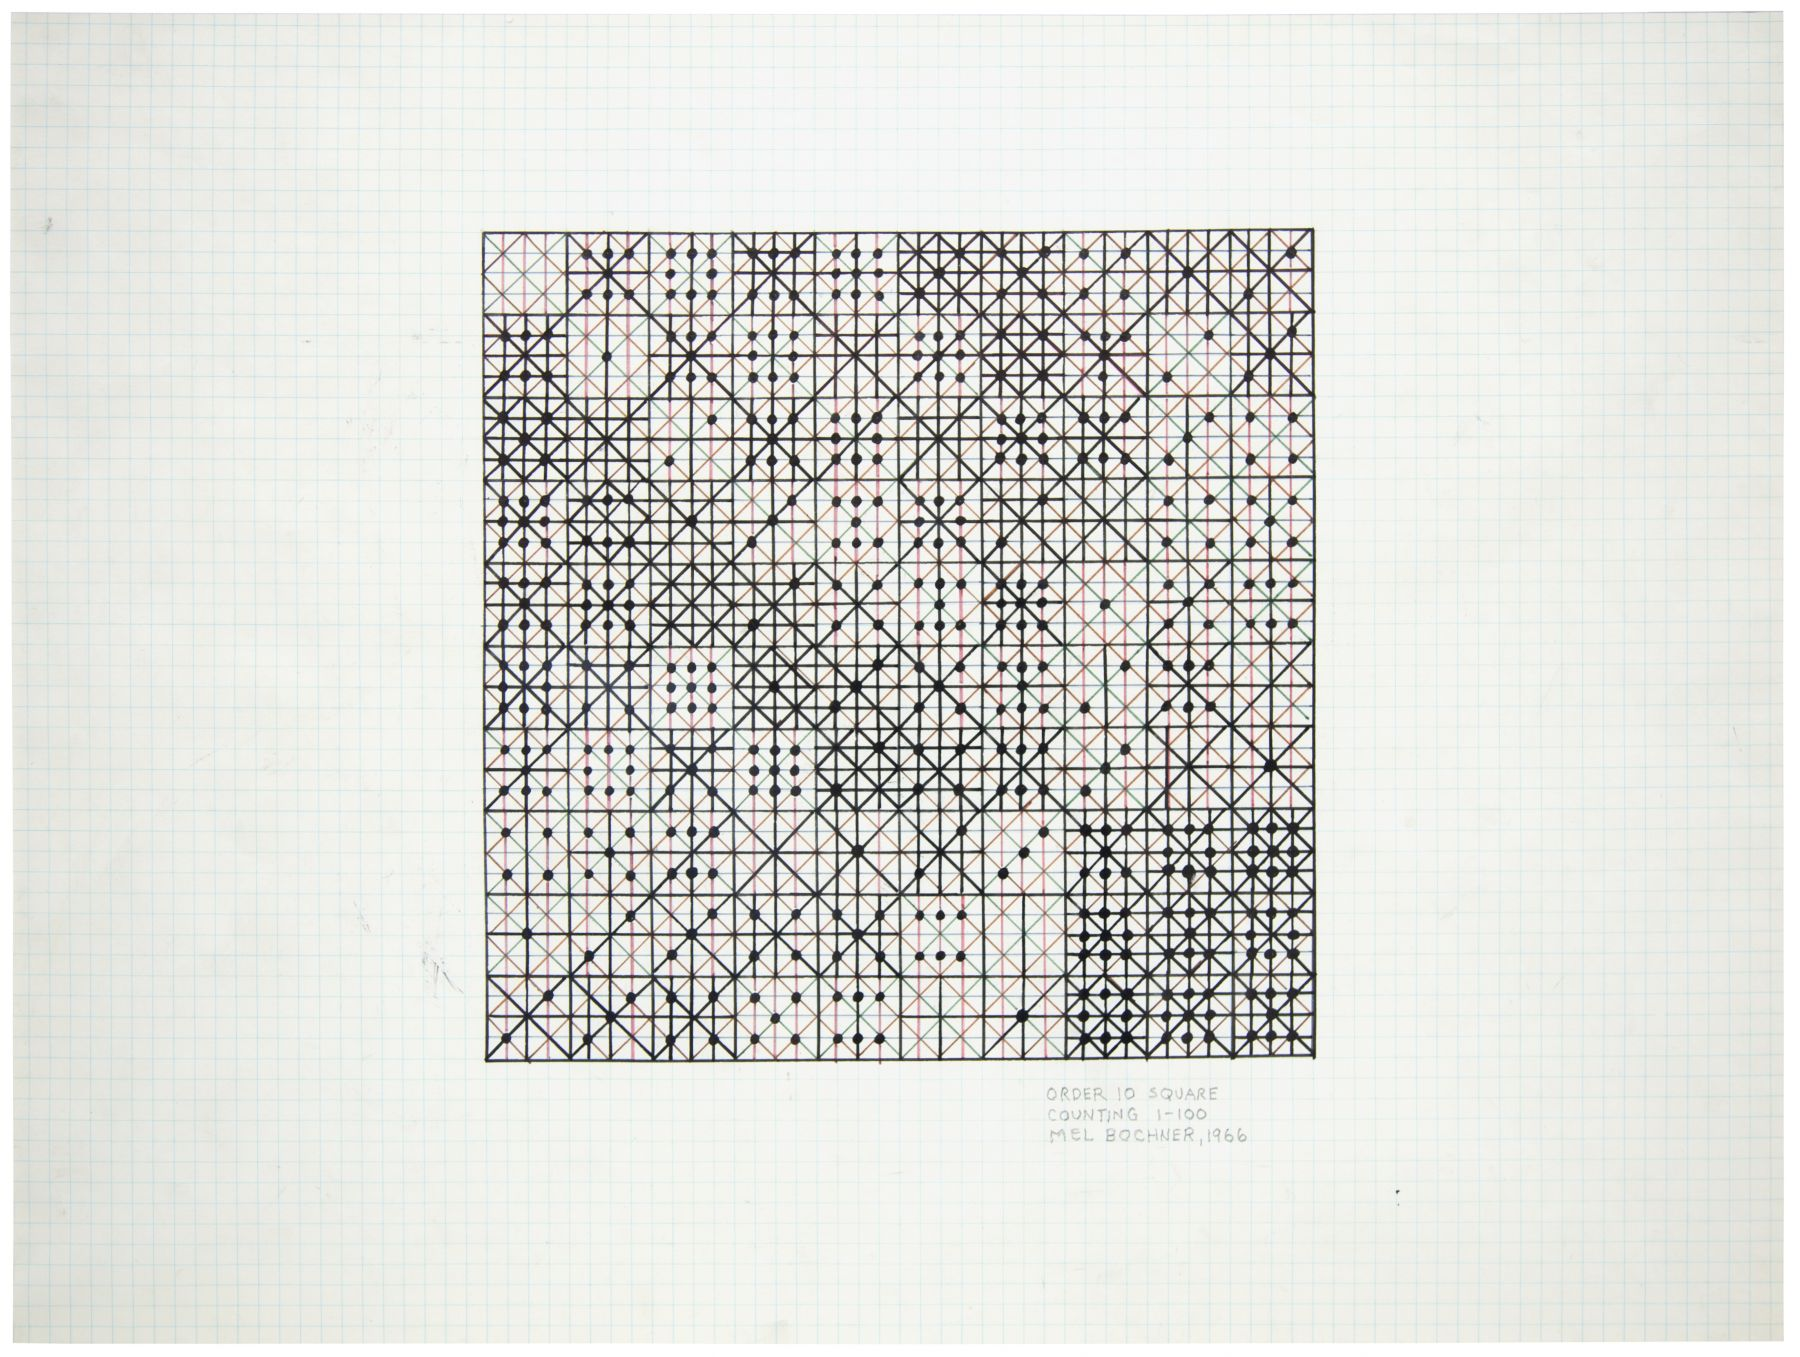 Mel Bochner, Order 10 Square: Counting 1-100, 1966.